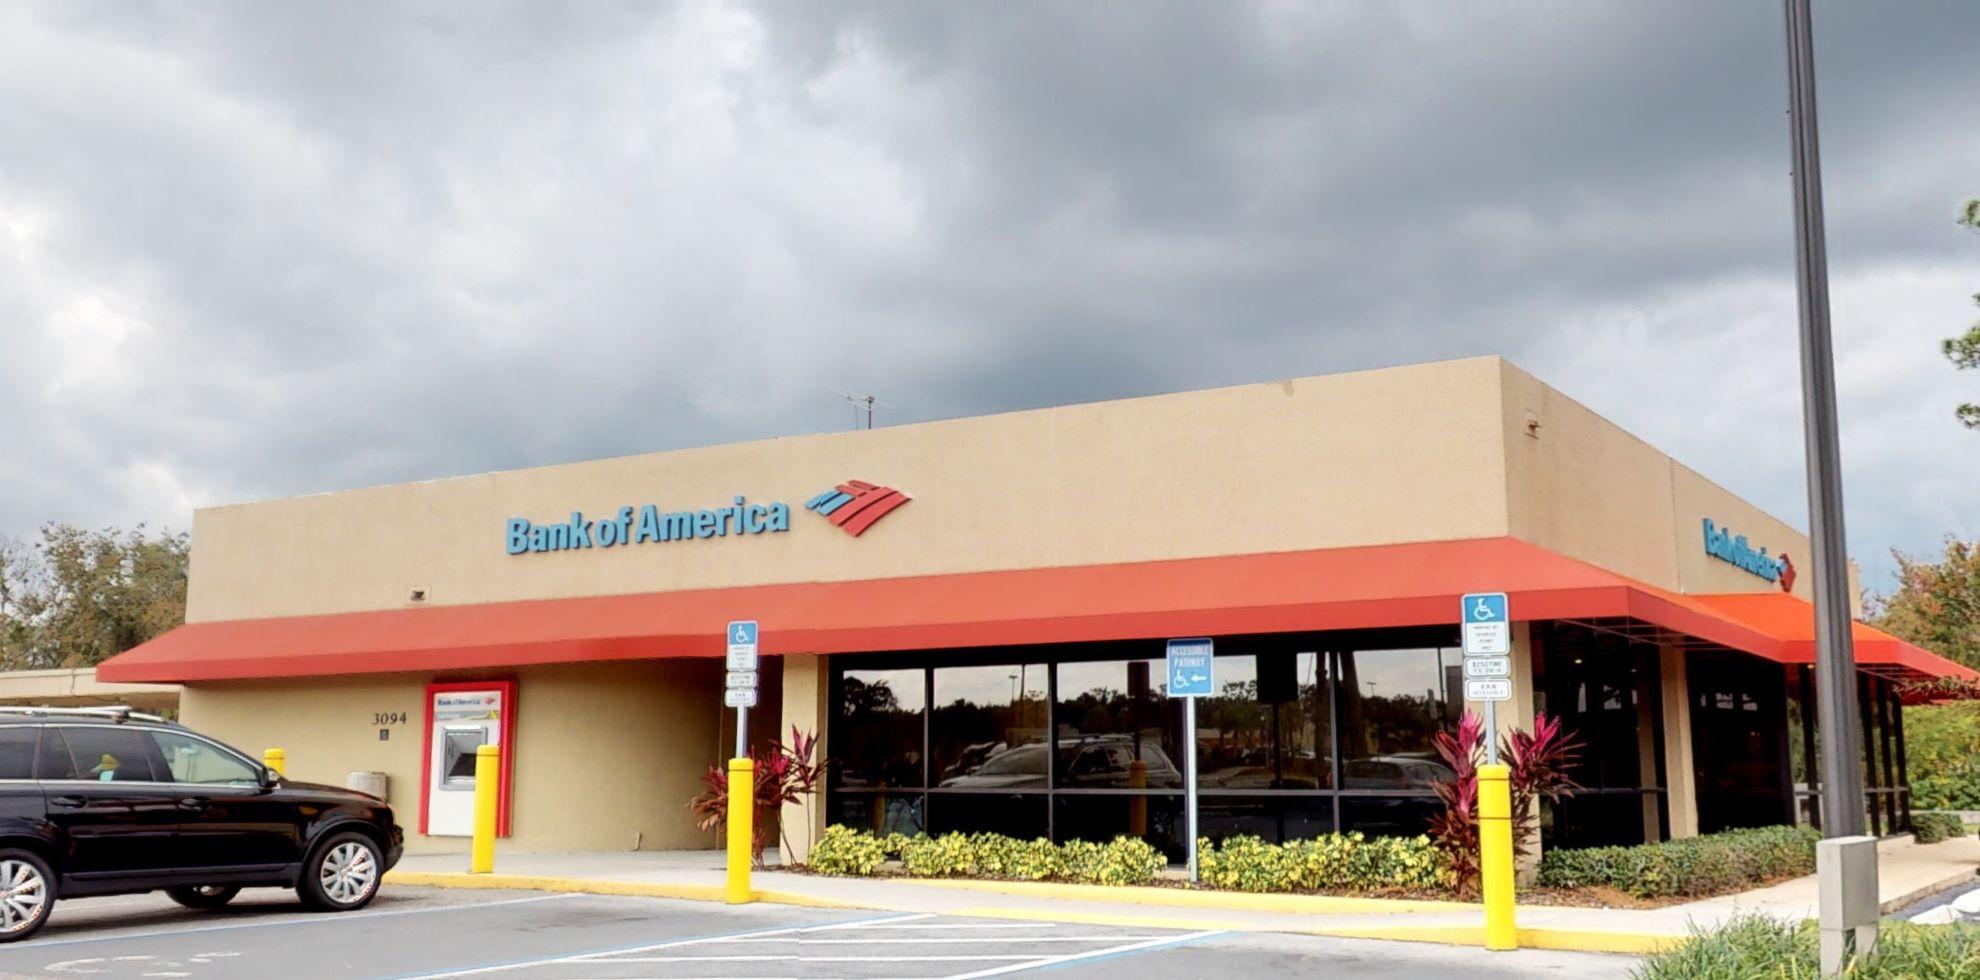 Bank of America financial center with drive-thru ATM   3094 S Orlando Dr, Sanford, FL 32773